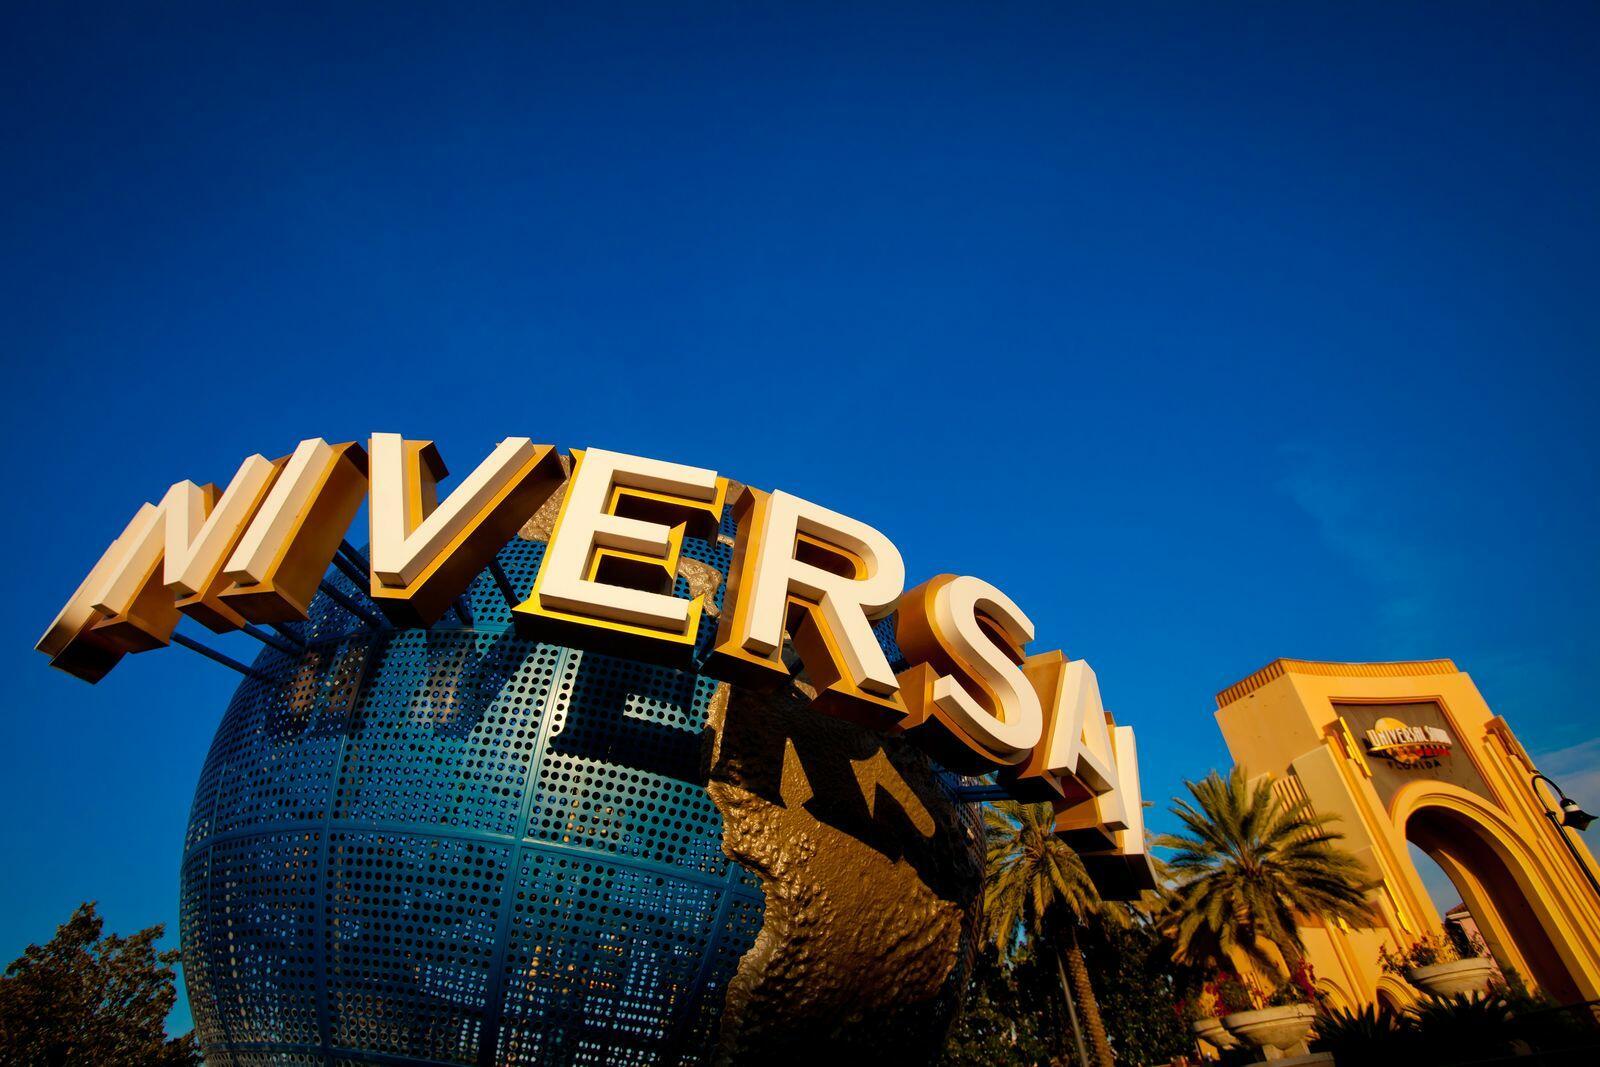 Giant globe outside of entrance to Universal Studios Florida.